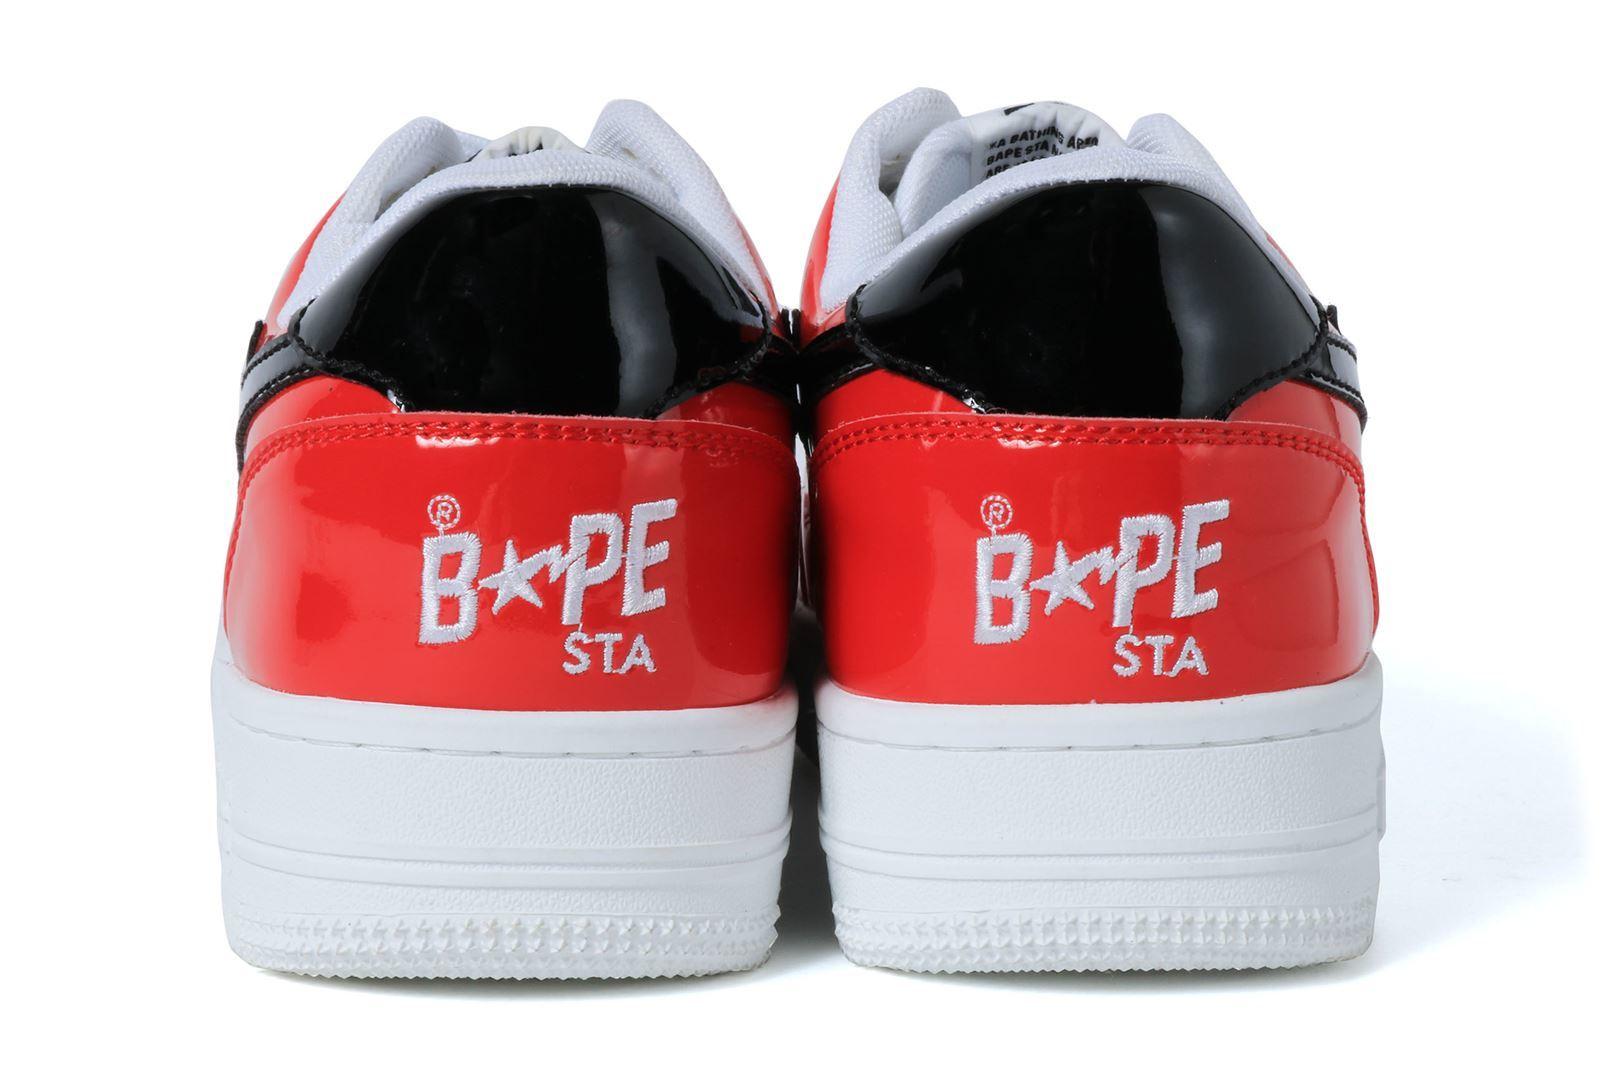 BAPE STA LOW_a0174495_11411326.jpg